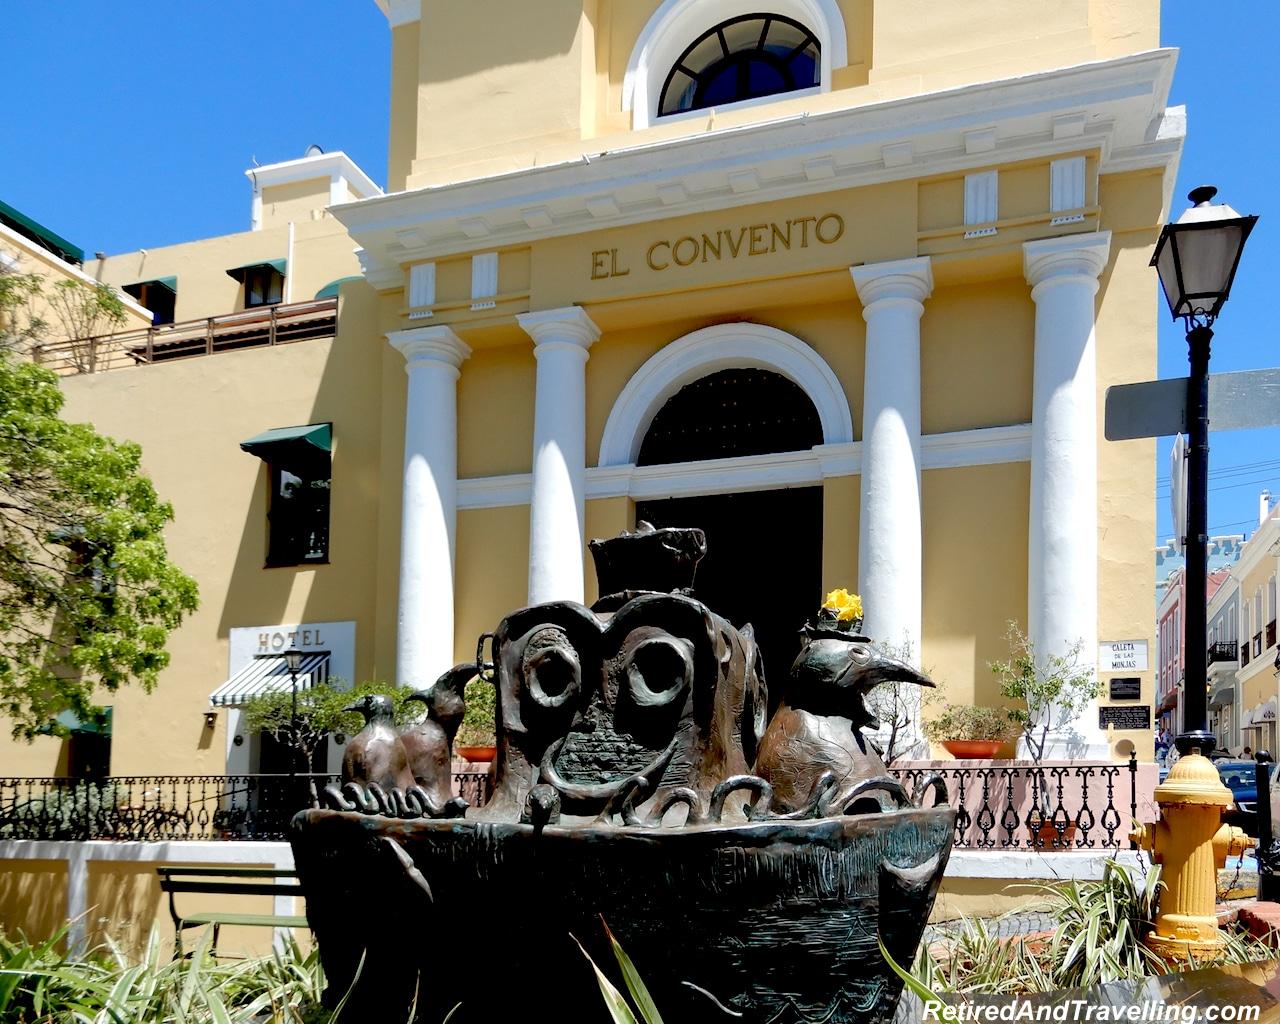 Plaza Felisa Rincon de Gautier Park Statues - Walking in San Juan.jpg